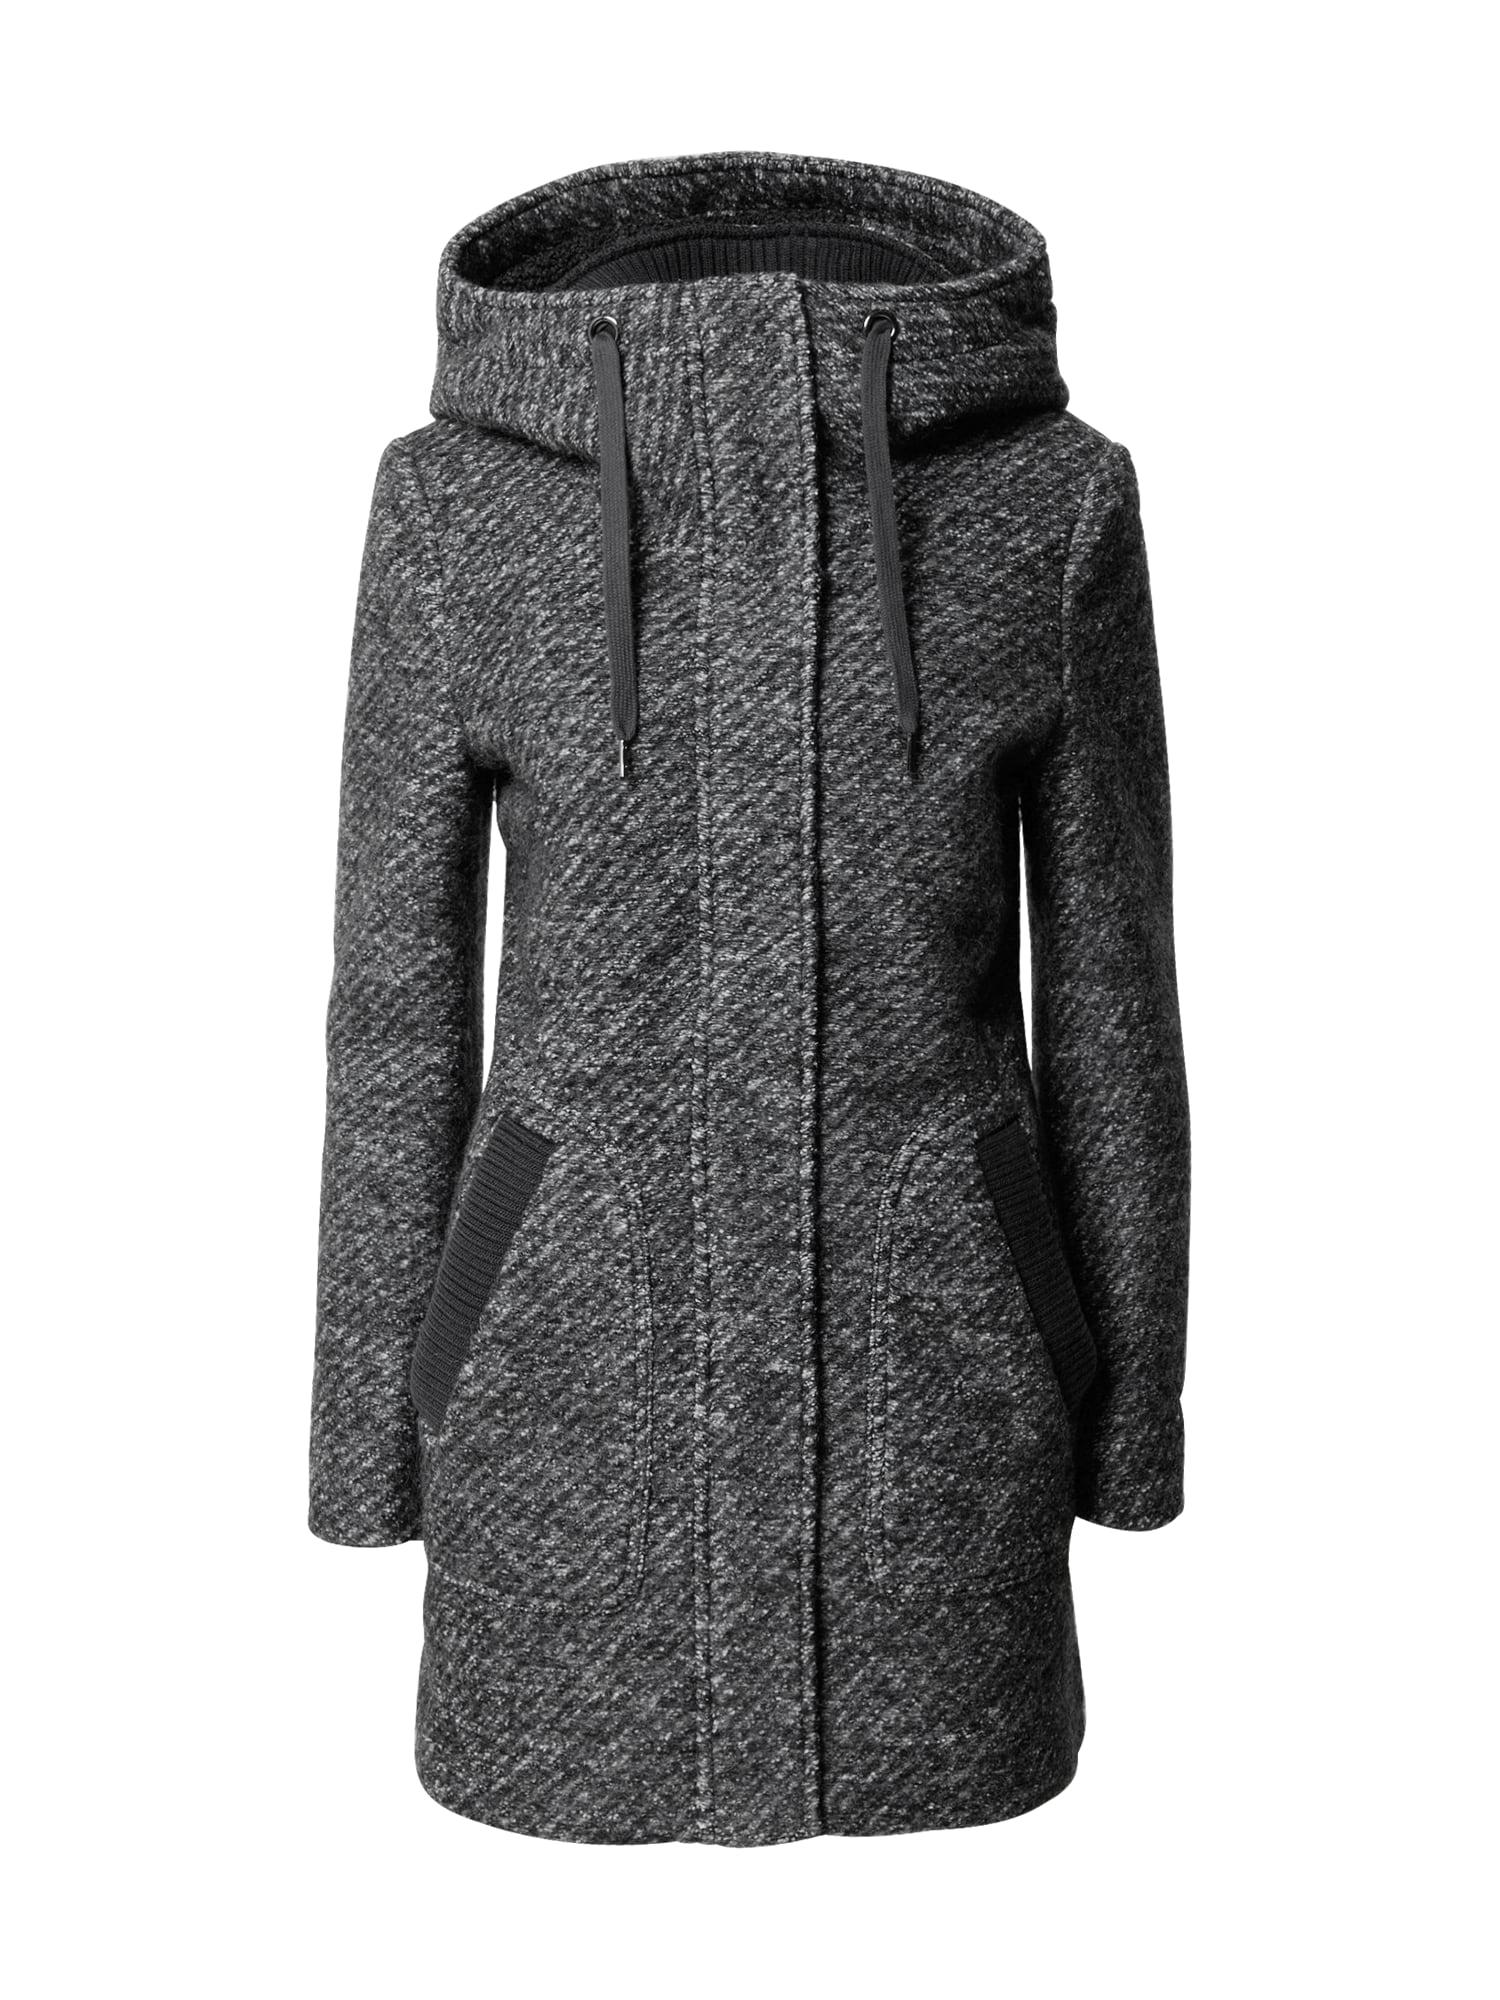 ESPRIT Demisezoninis paltas tamsiai pilka